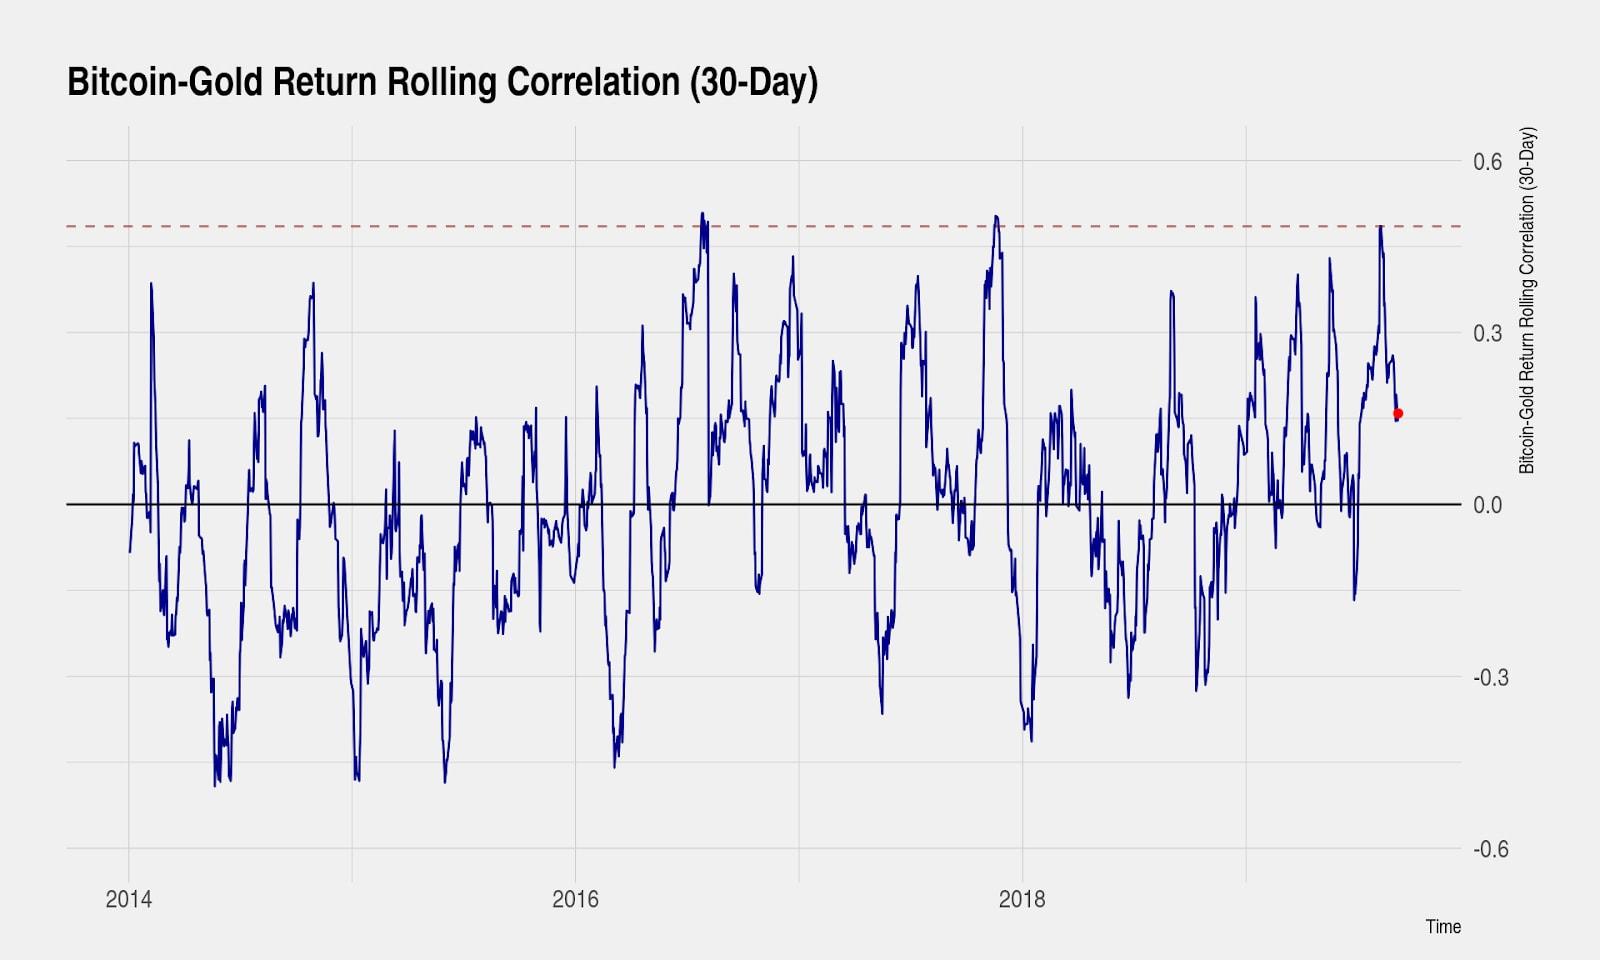 Bitcoin-gold correlation